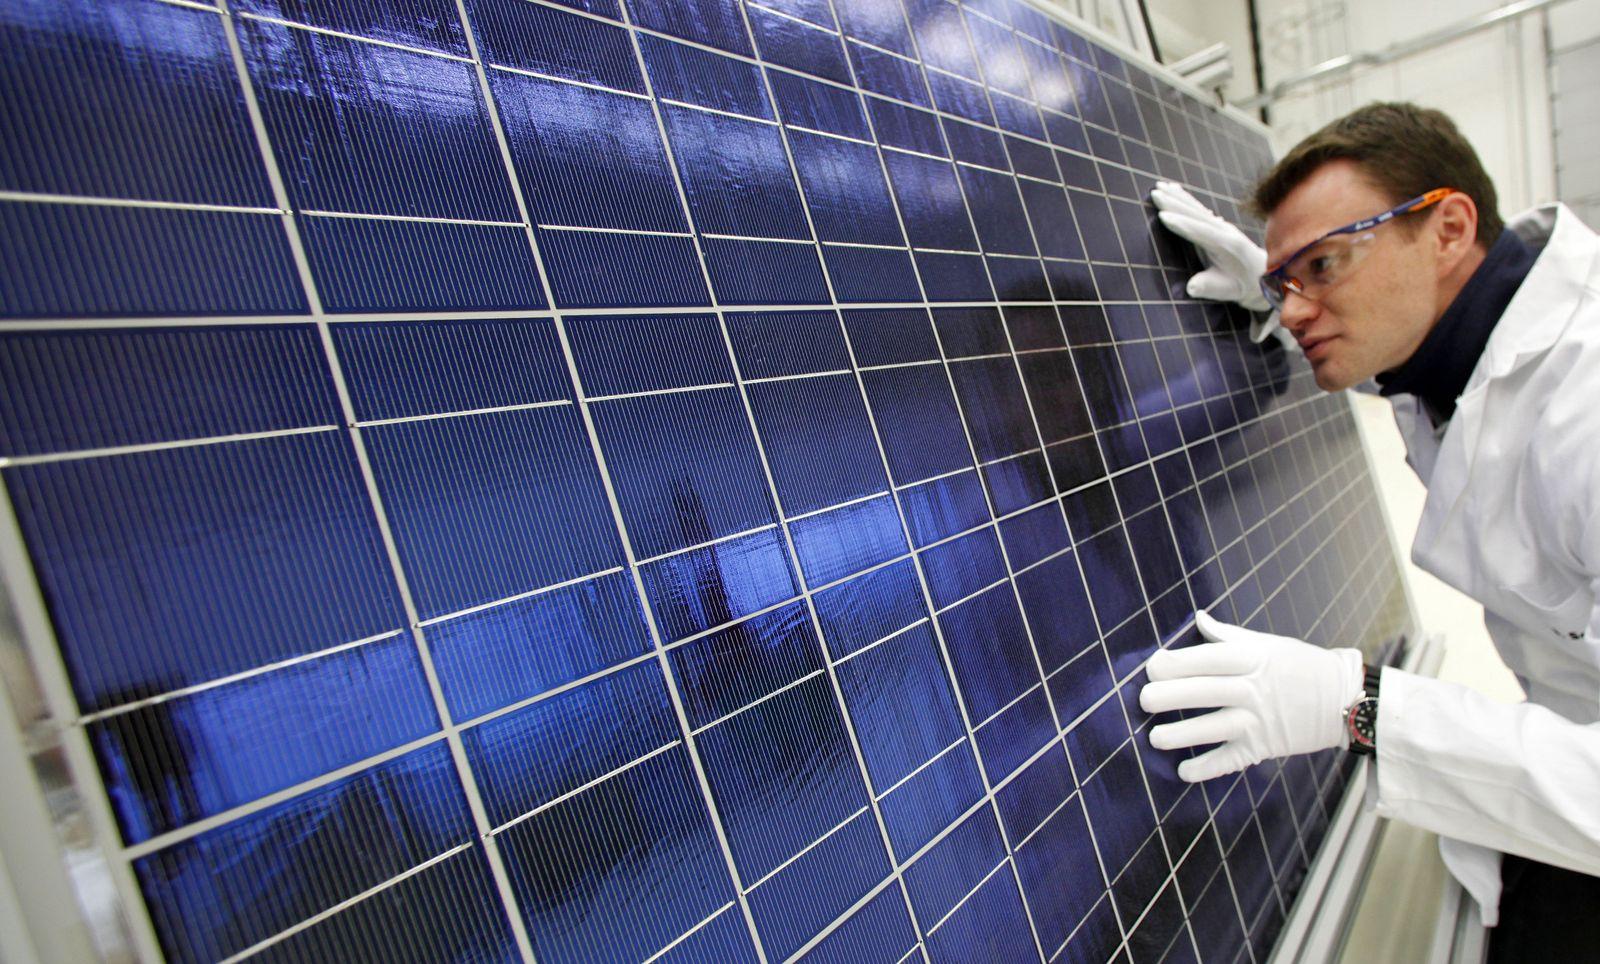 Fotovoltaik / Solarzelle / Fraunhofer Institut Halle